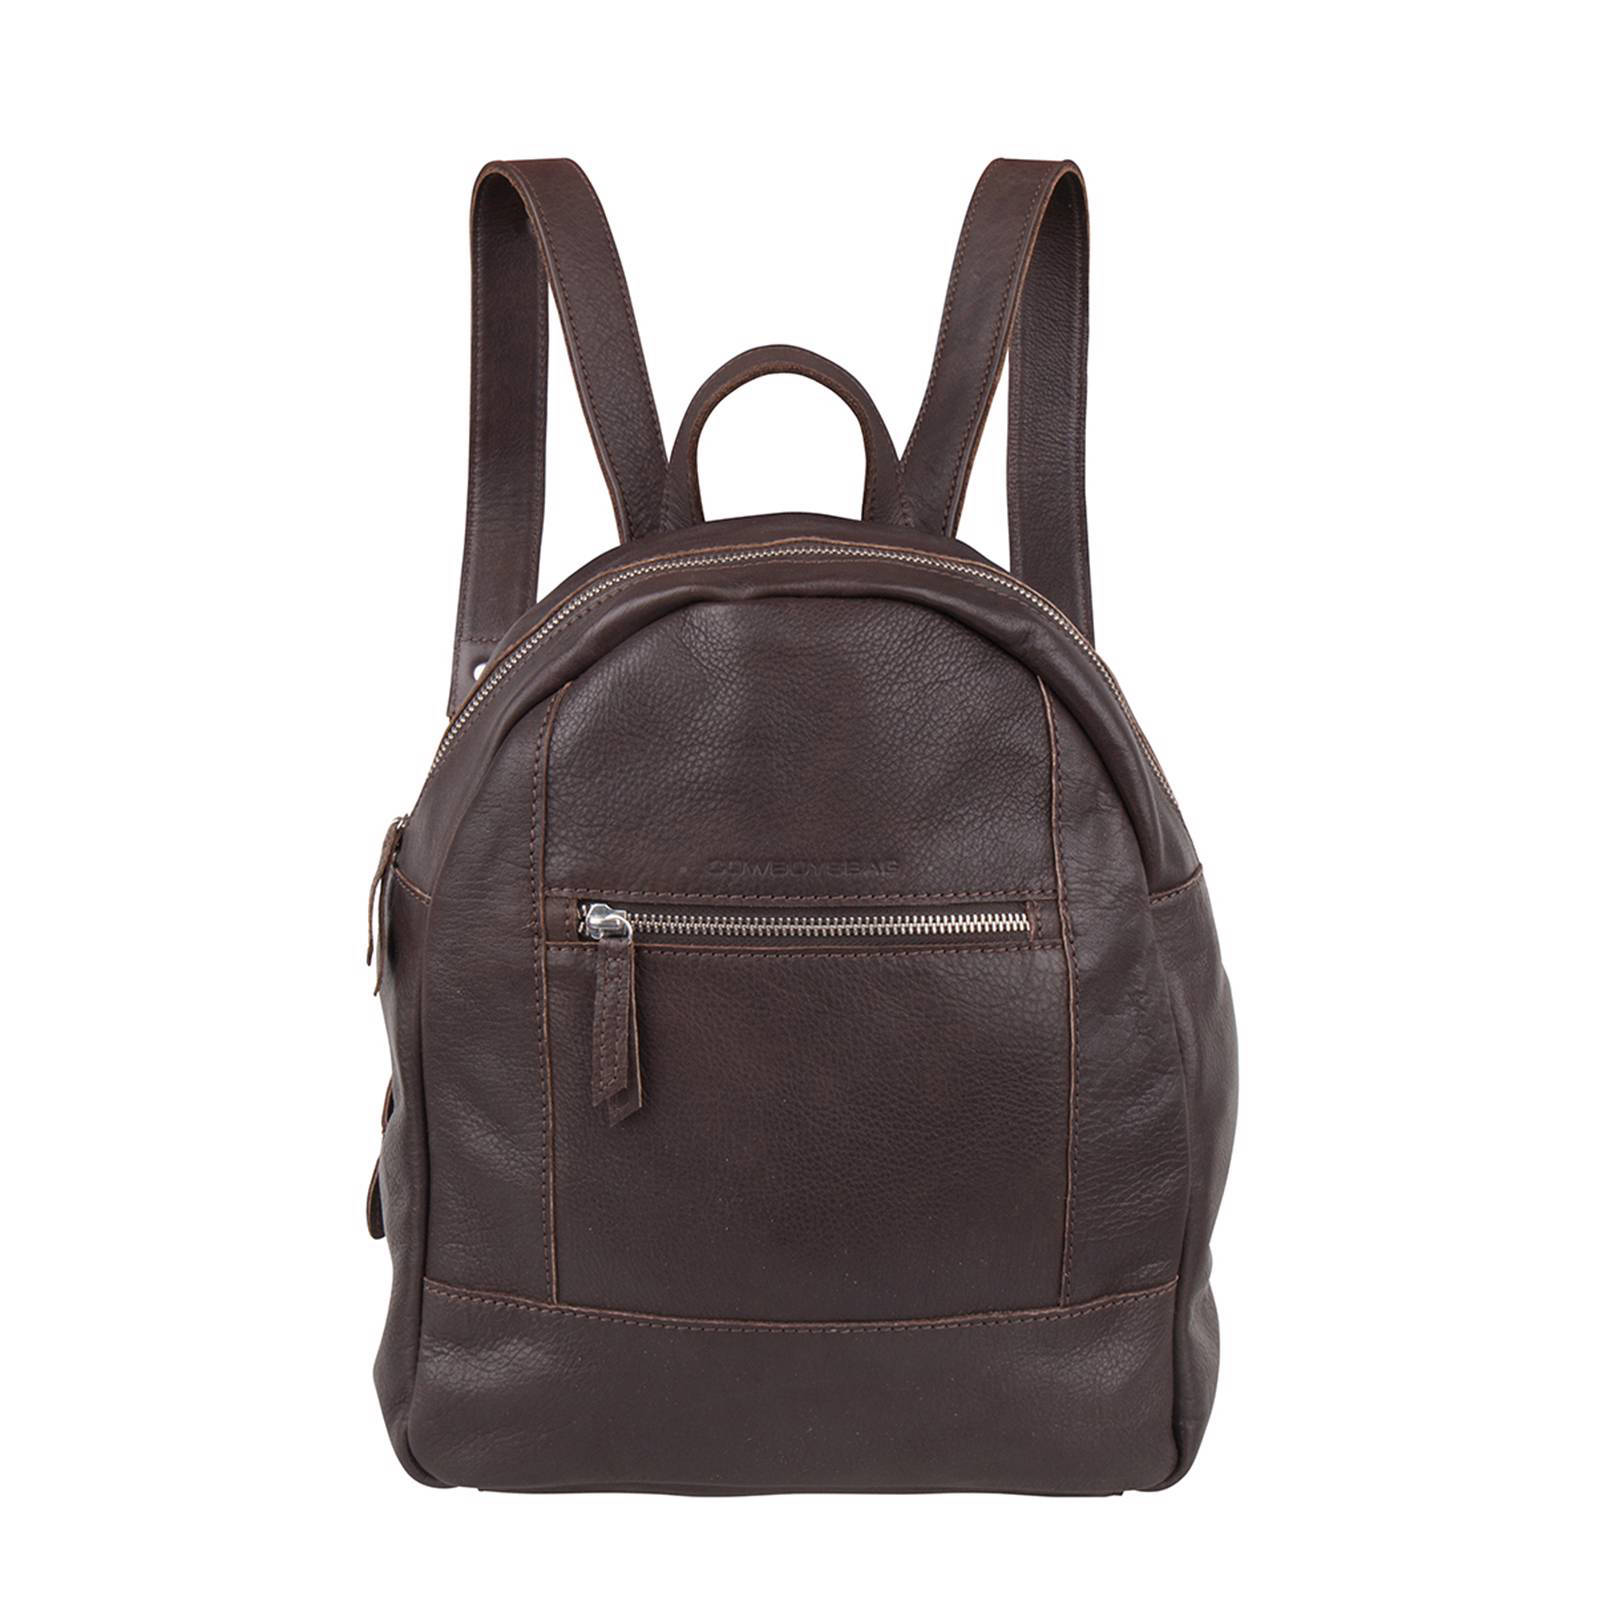 7e1e8402302 Cowboysbag leren rugzak Backpack Georgetown | wehkamp